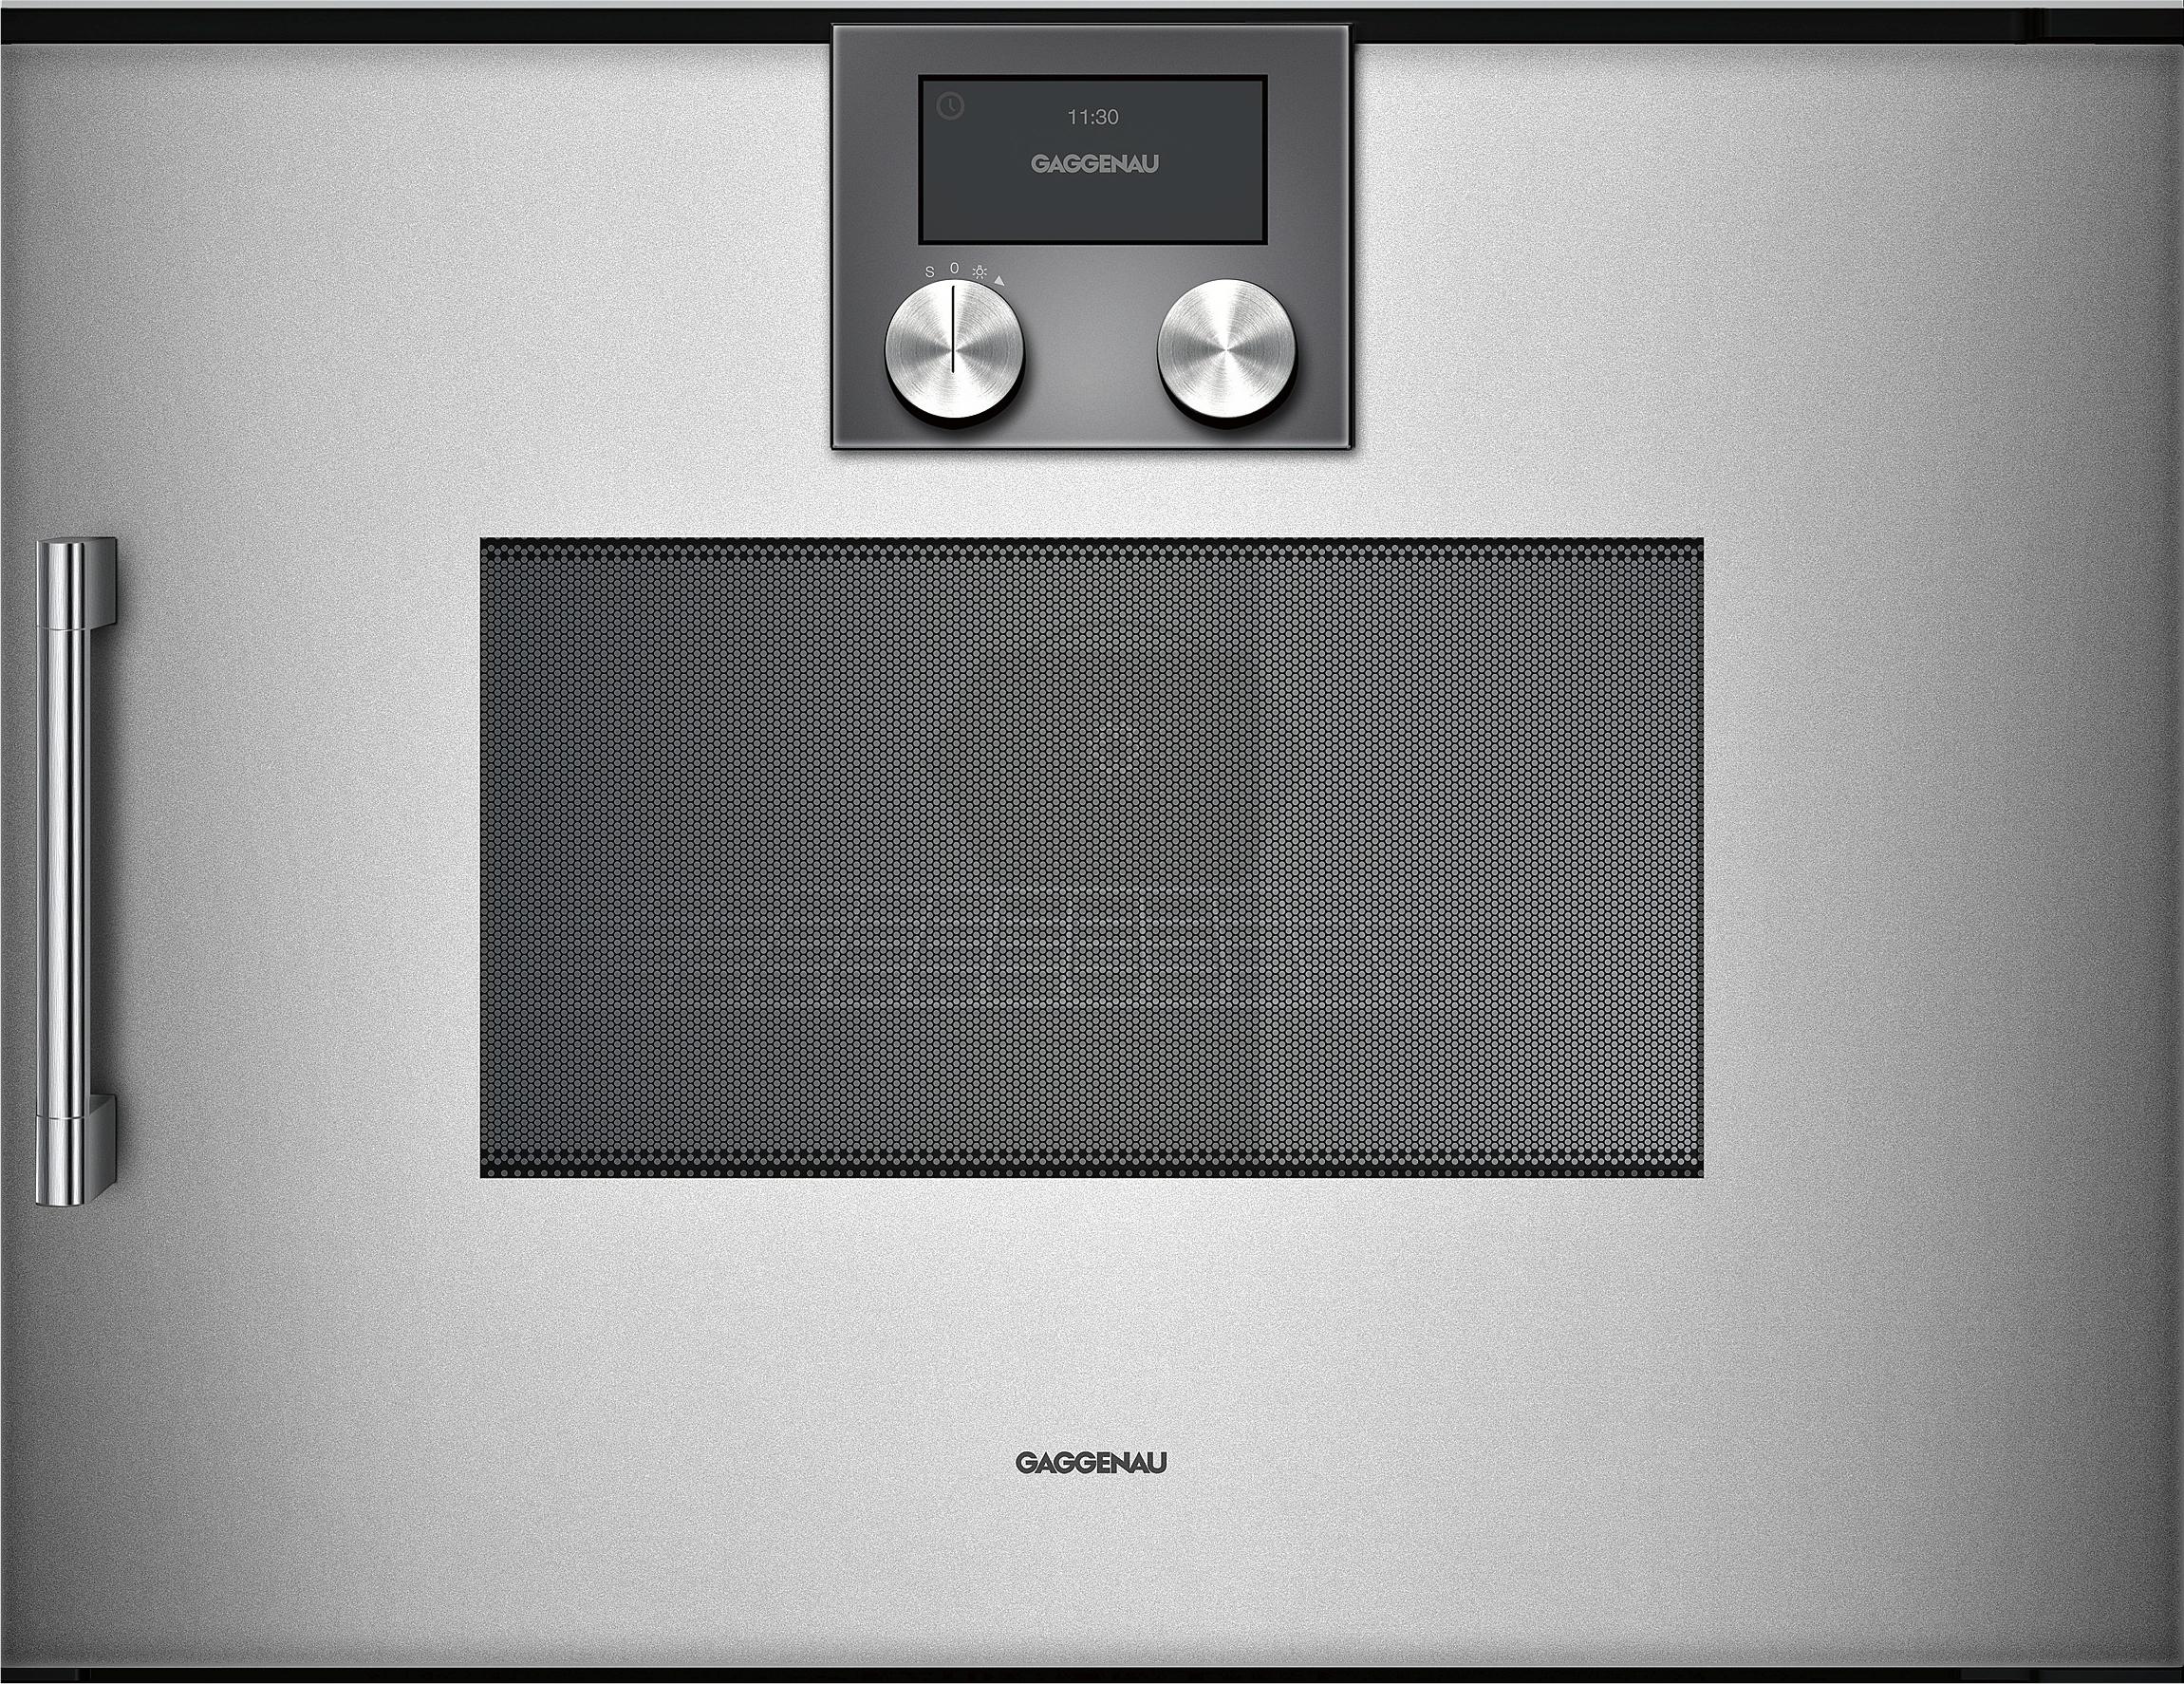 gaggenau bmp250110 mikrowellen backofen serie 200. Black Bedroom Furniture Sets. Home Design Ideas